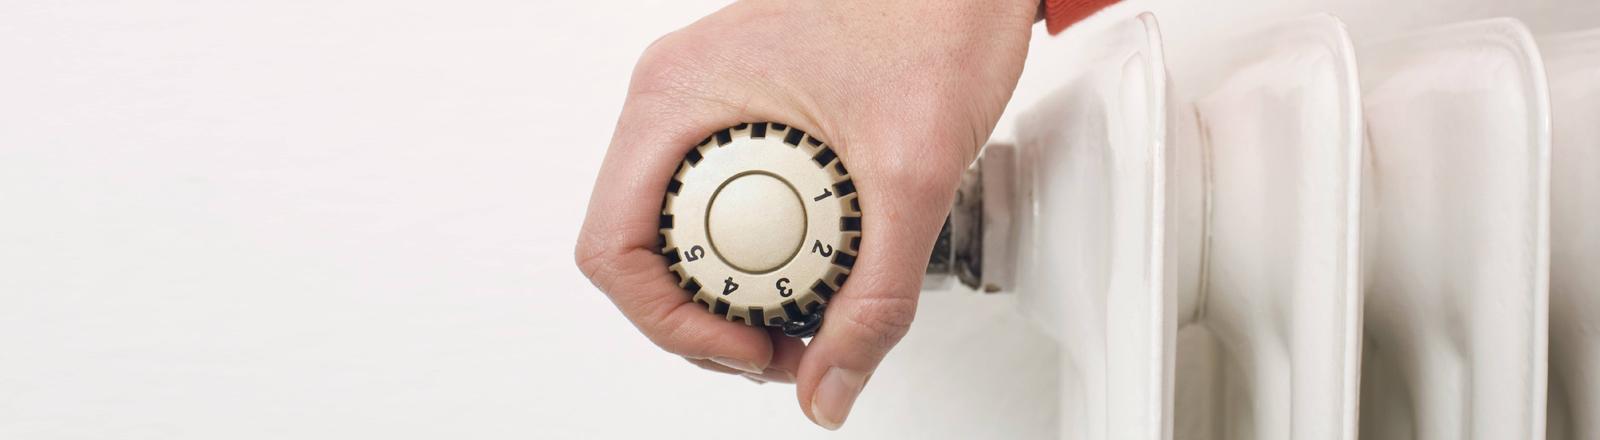 Heizkörper mit Thermostat-Regler